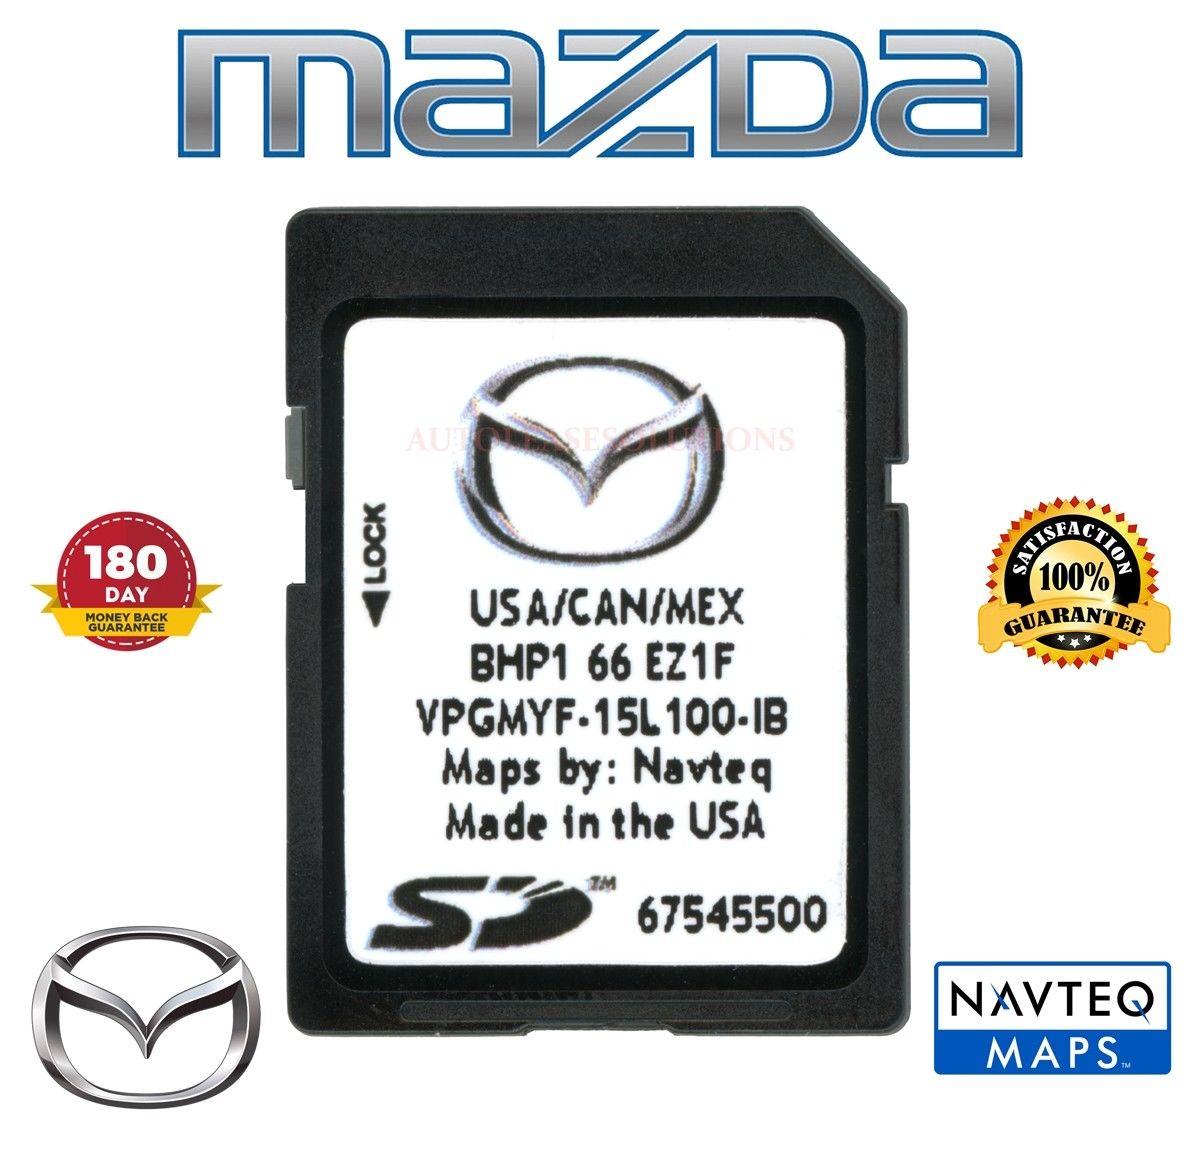 Awesome 2016 2017 2018 MAZDA Navigation SD Card BHP1 66 EZ1F Mazda 3 6 CX-3  CX-5 2018-2019